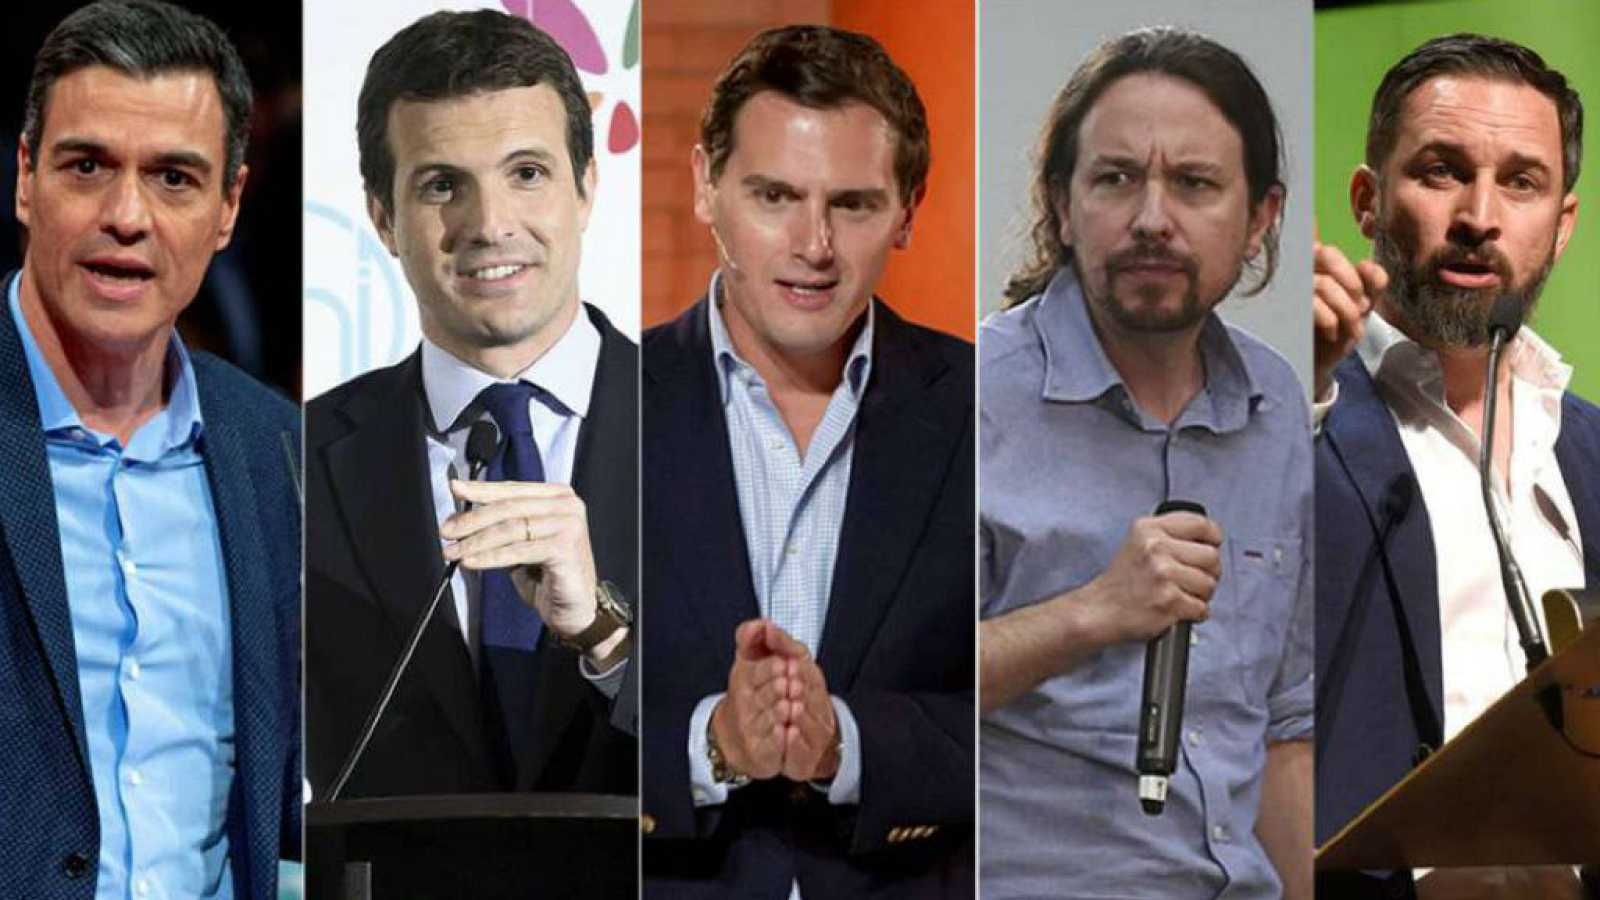 Todo Noticias - Mañana - Un gobierno de coalición, ¿es imposible en España? - Escuchar ahora